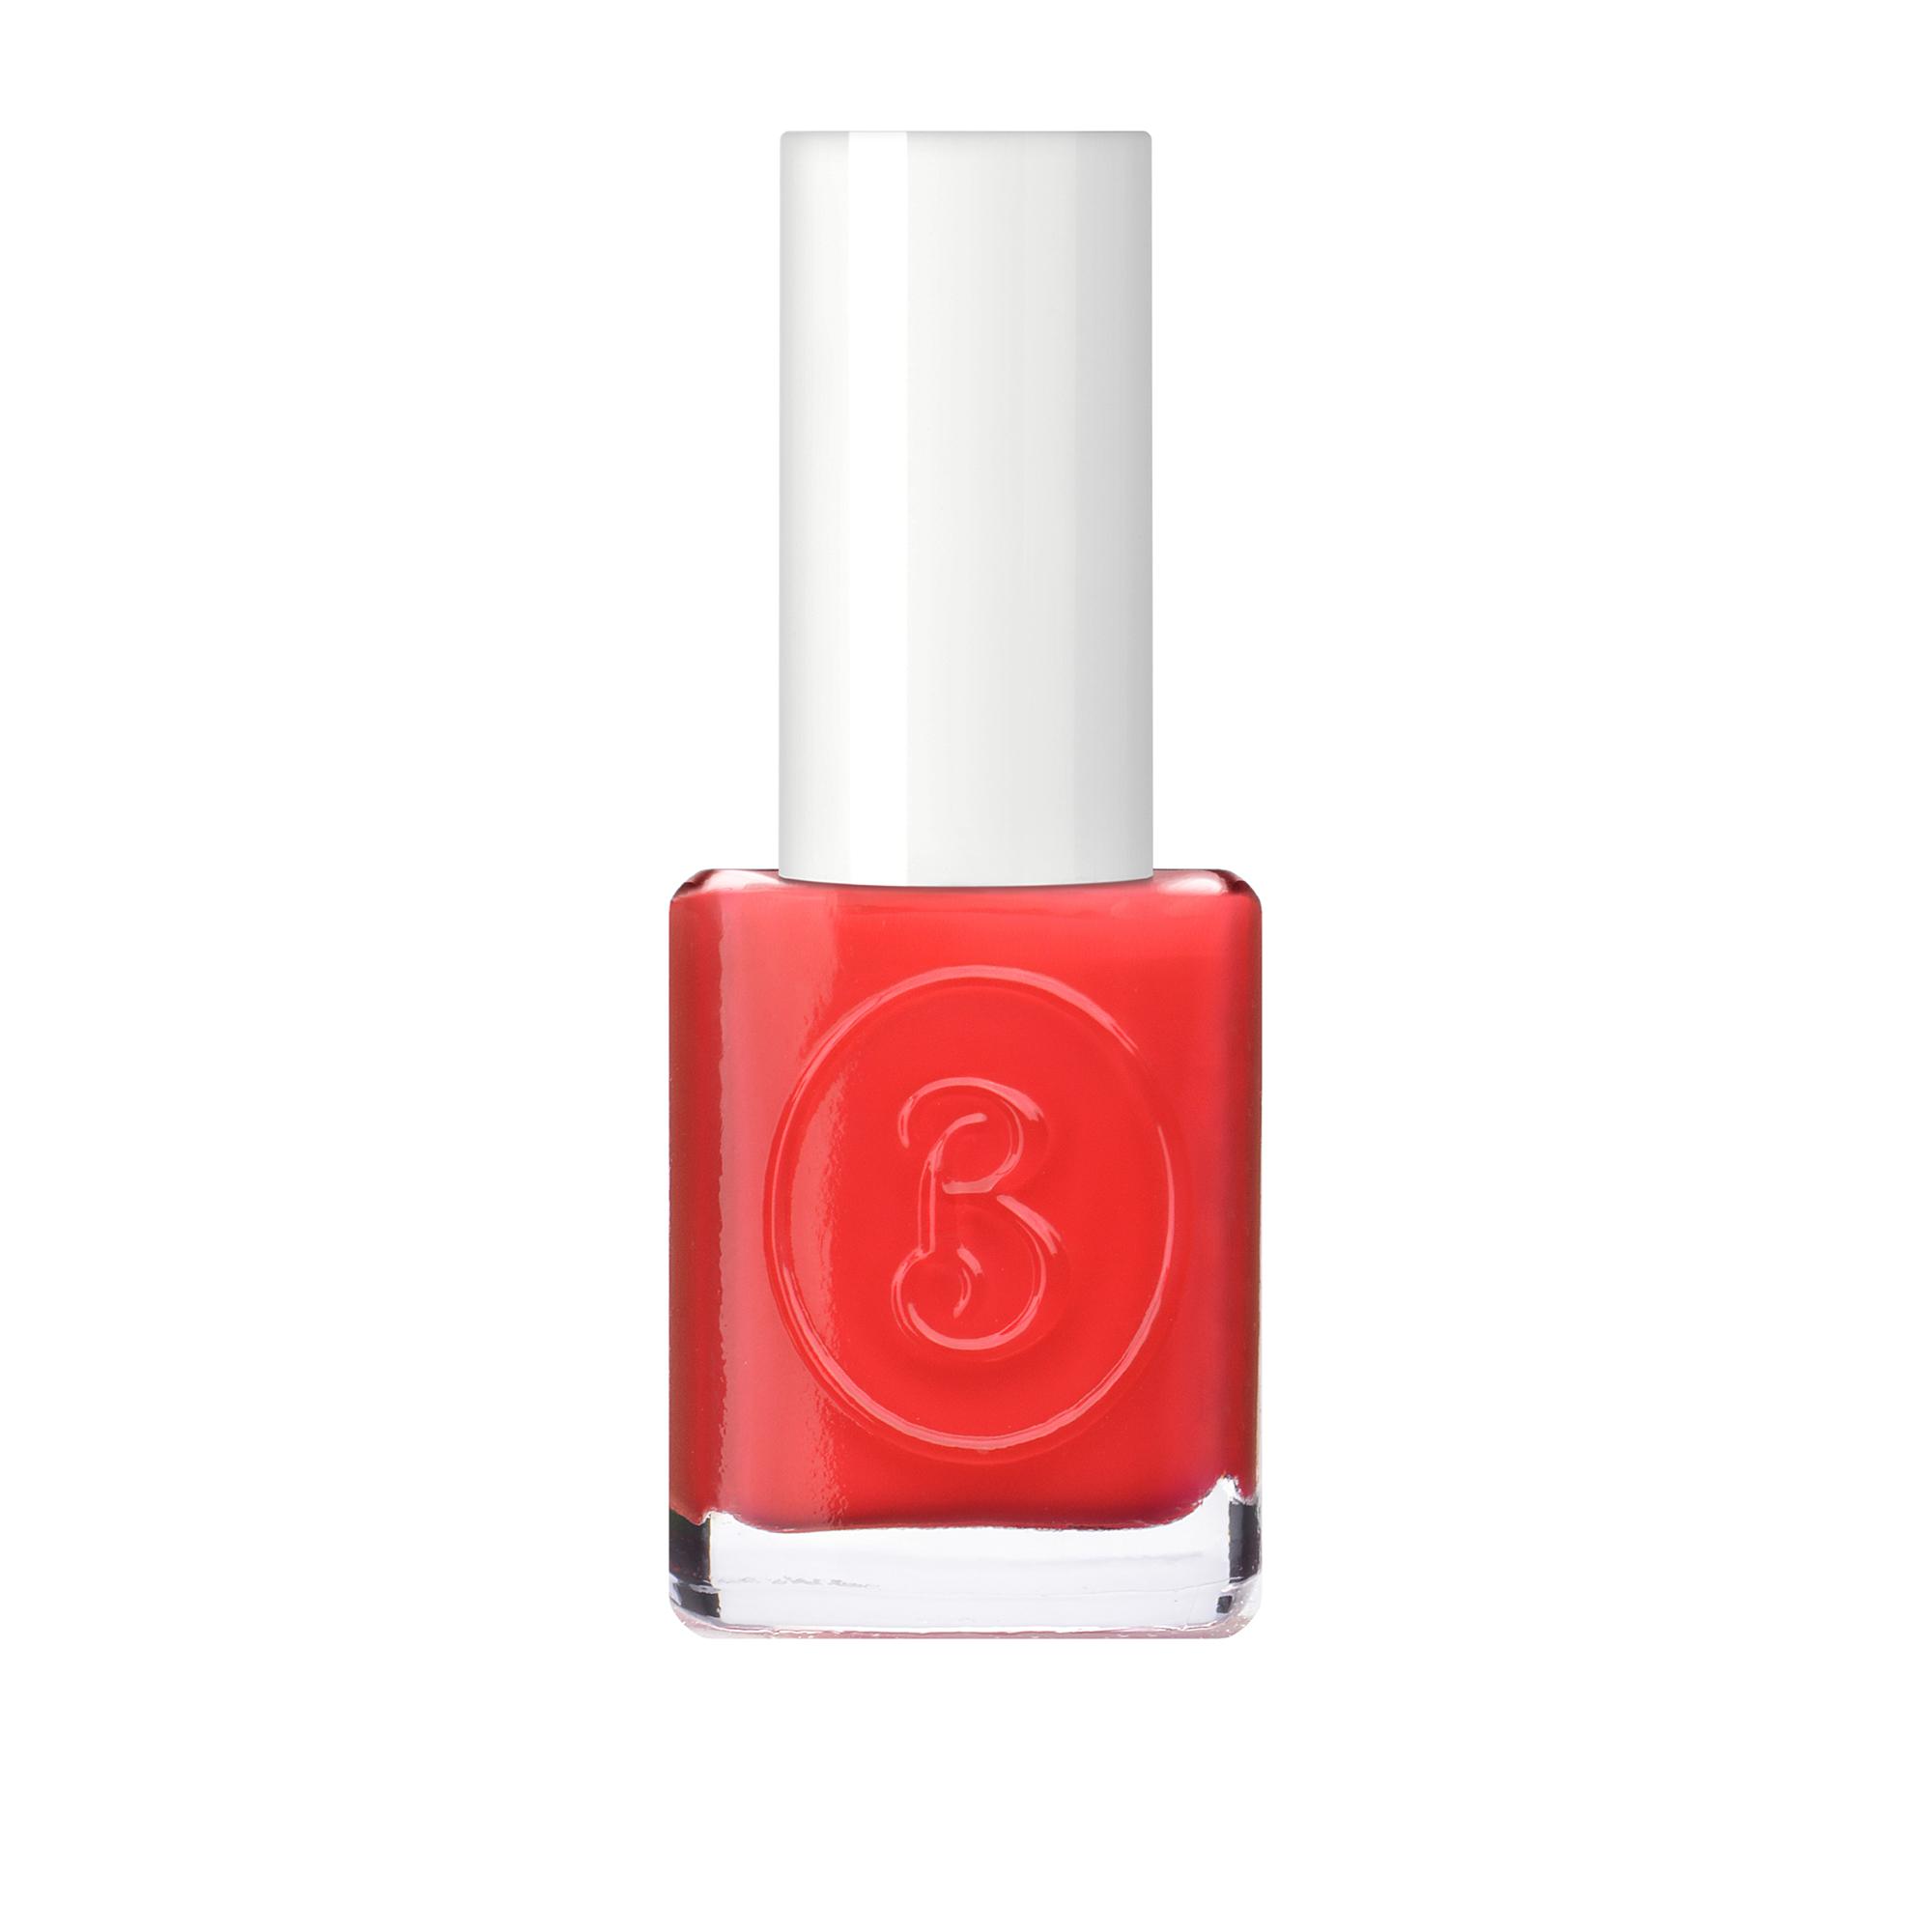 BERENICE 13 лак для ногтей, оранжево-красный / Orange red 16 мл berenice 53 лак для ногтей рыжая лиса red fox 16 мл